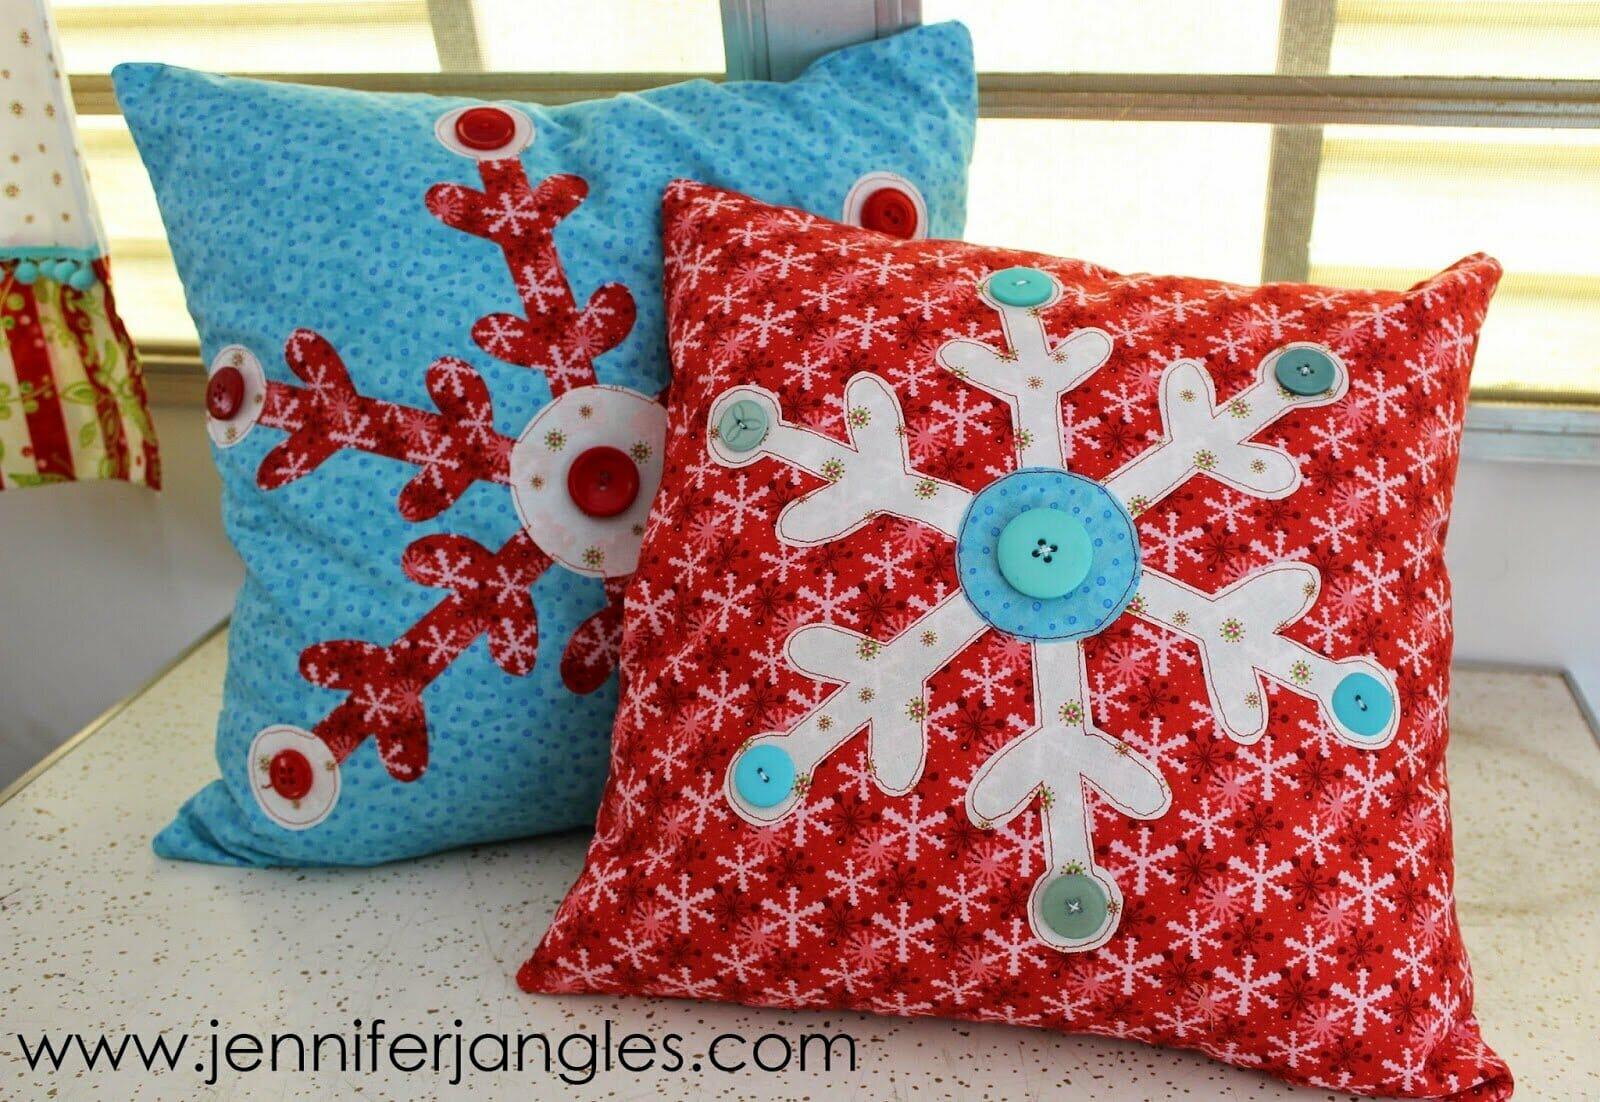 Snowflake+pillows.jpg